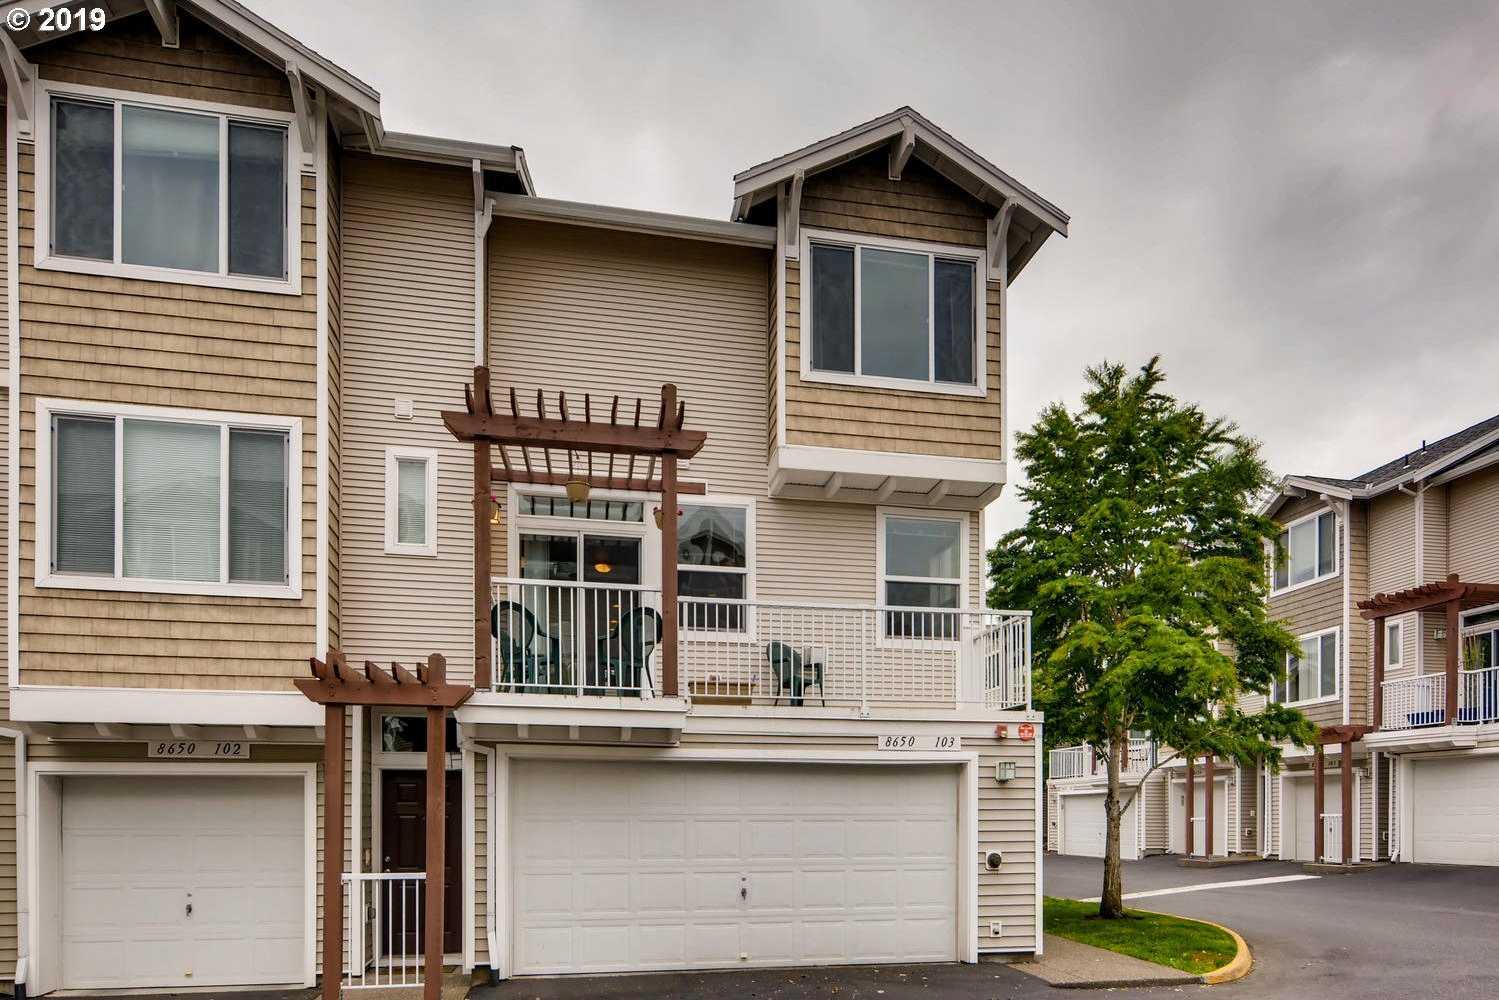 $335,000 - 3Br/3Ba -  for Sale in Sexton Crest, Beaverton